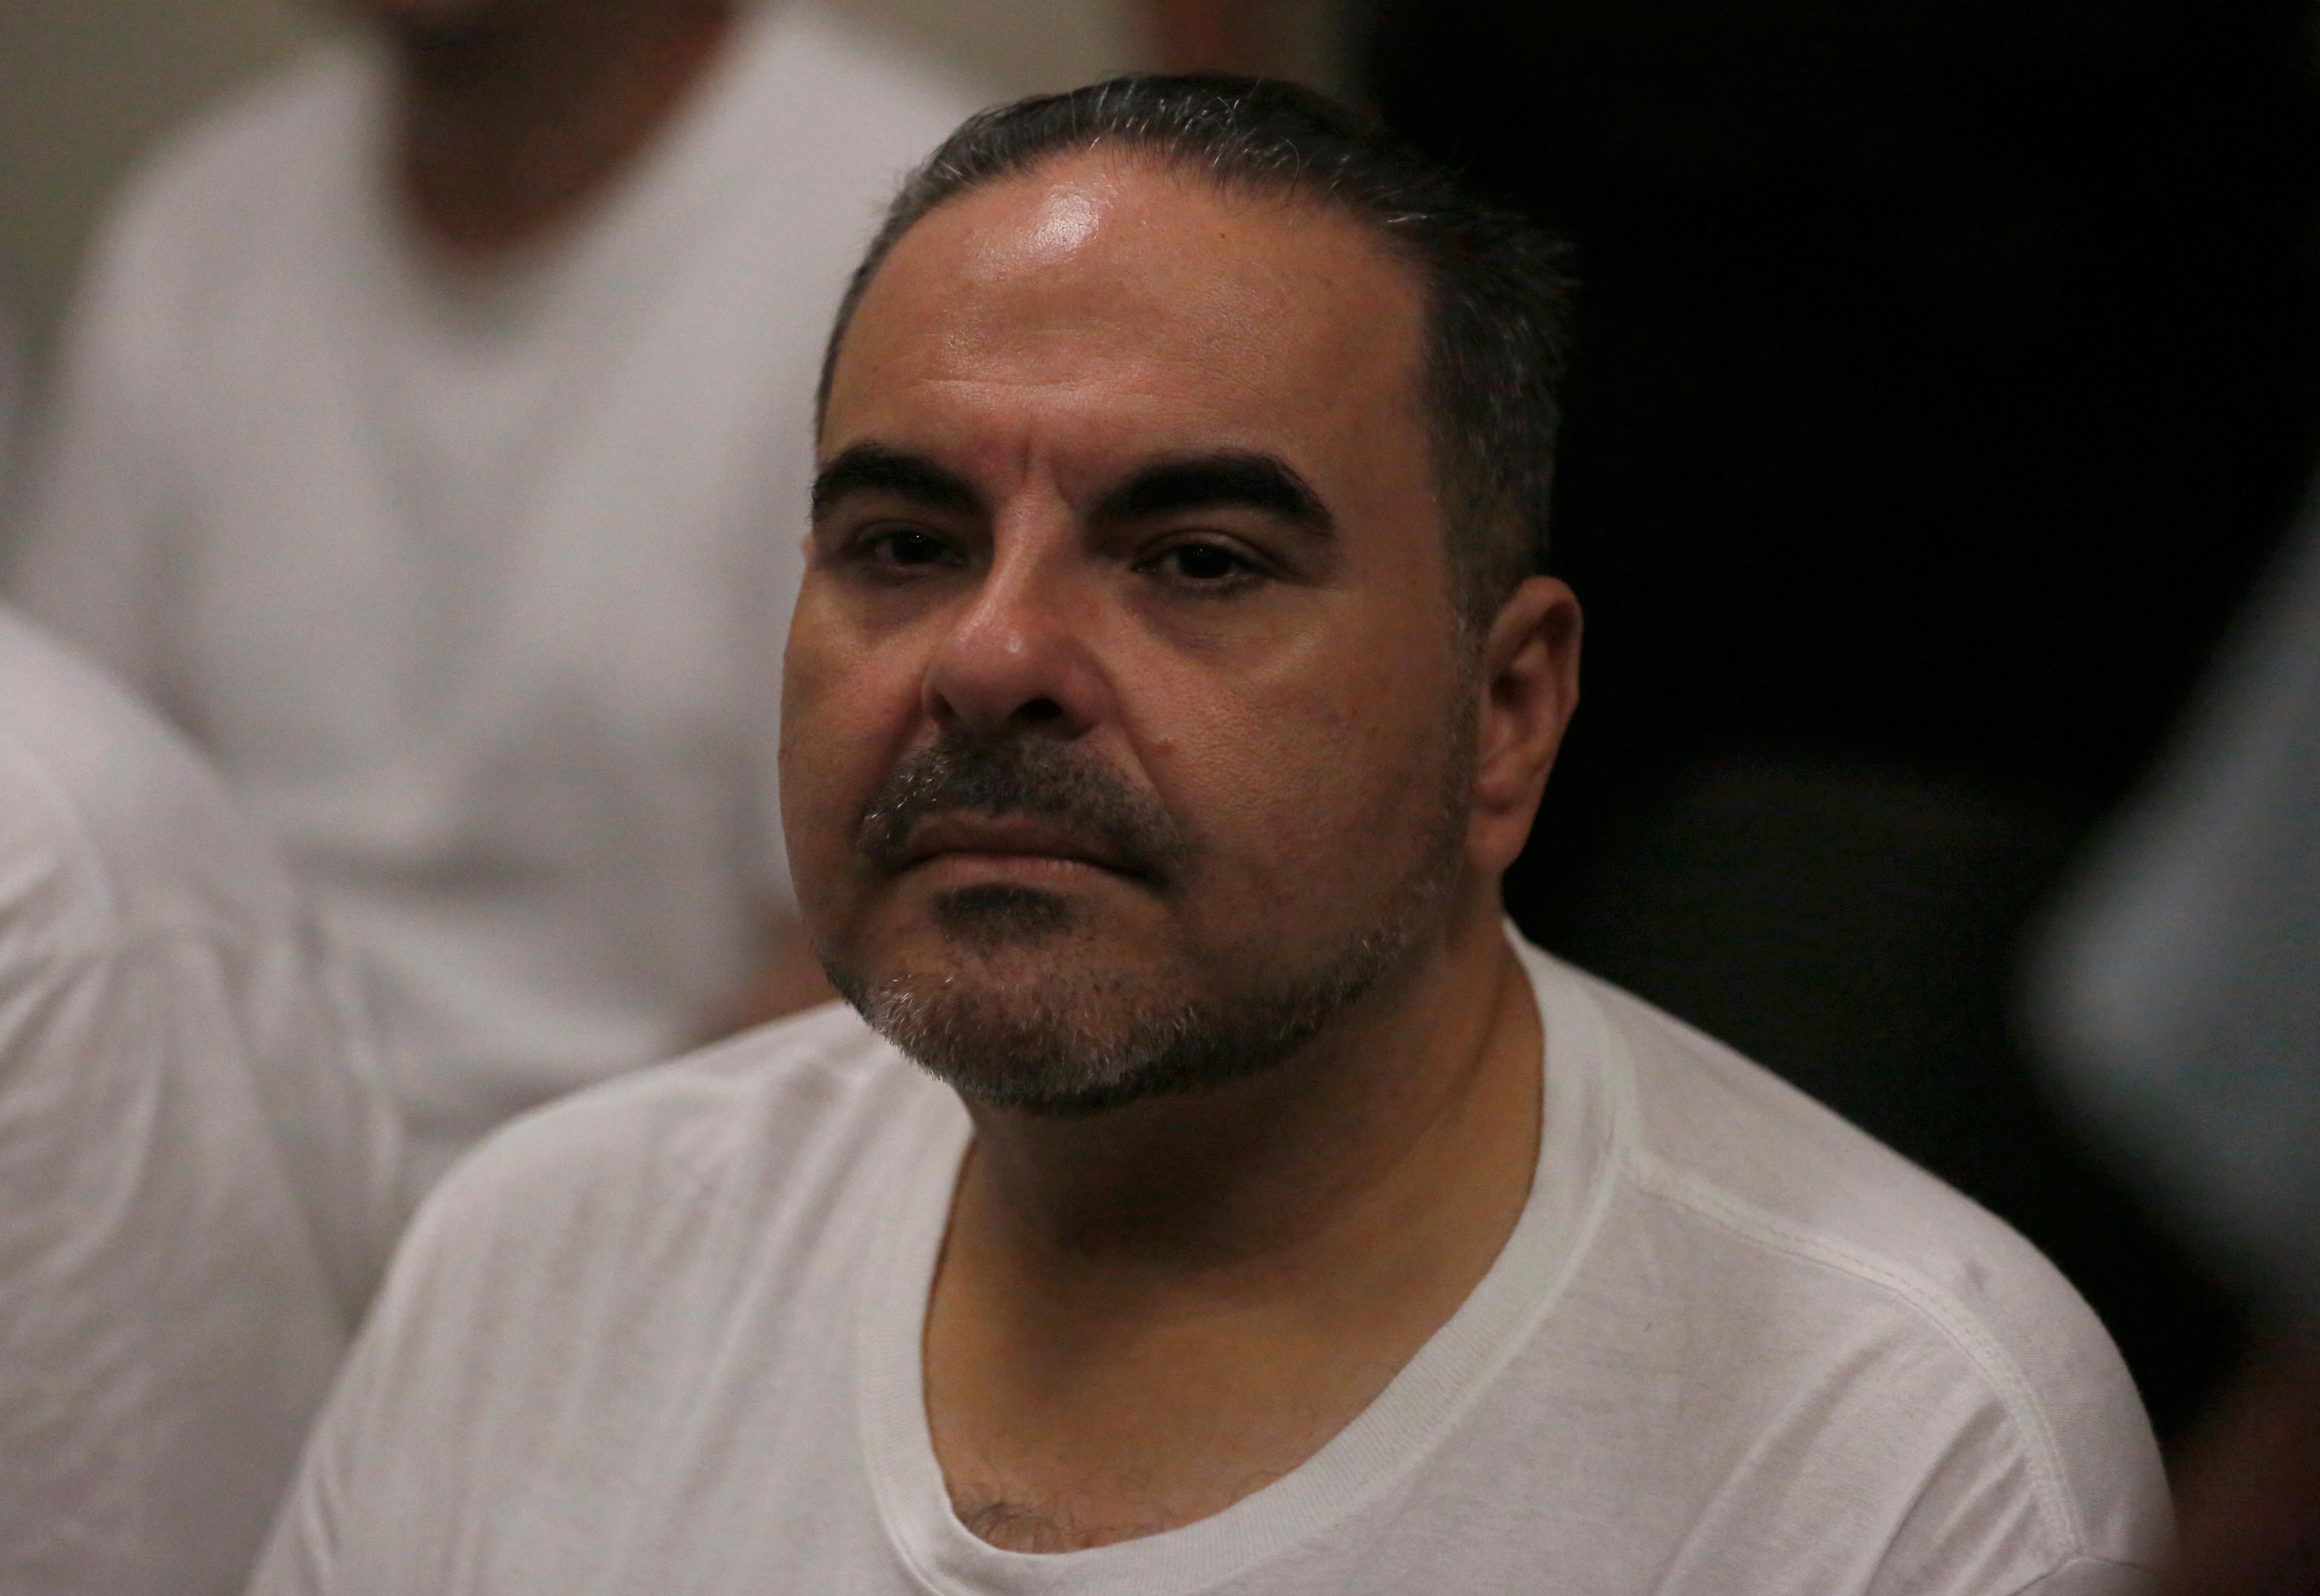 Former El Salvador President Saca gets two-year prison term for...